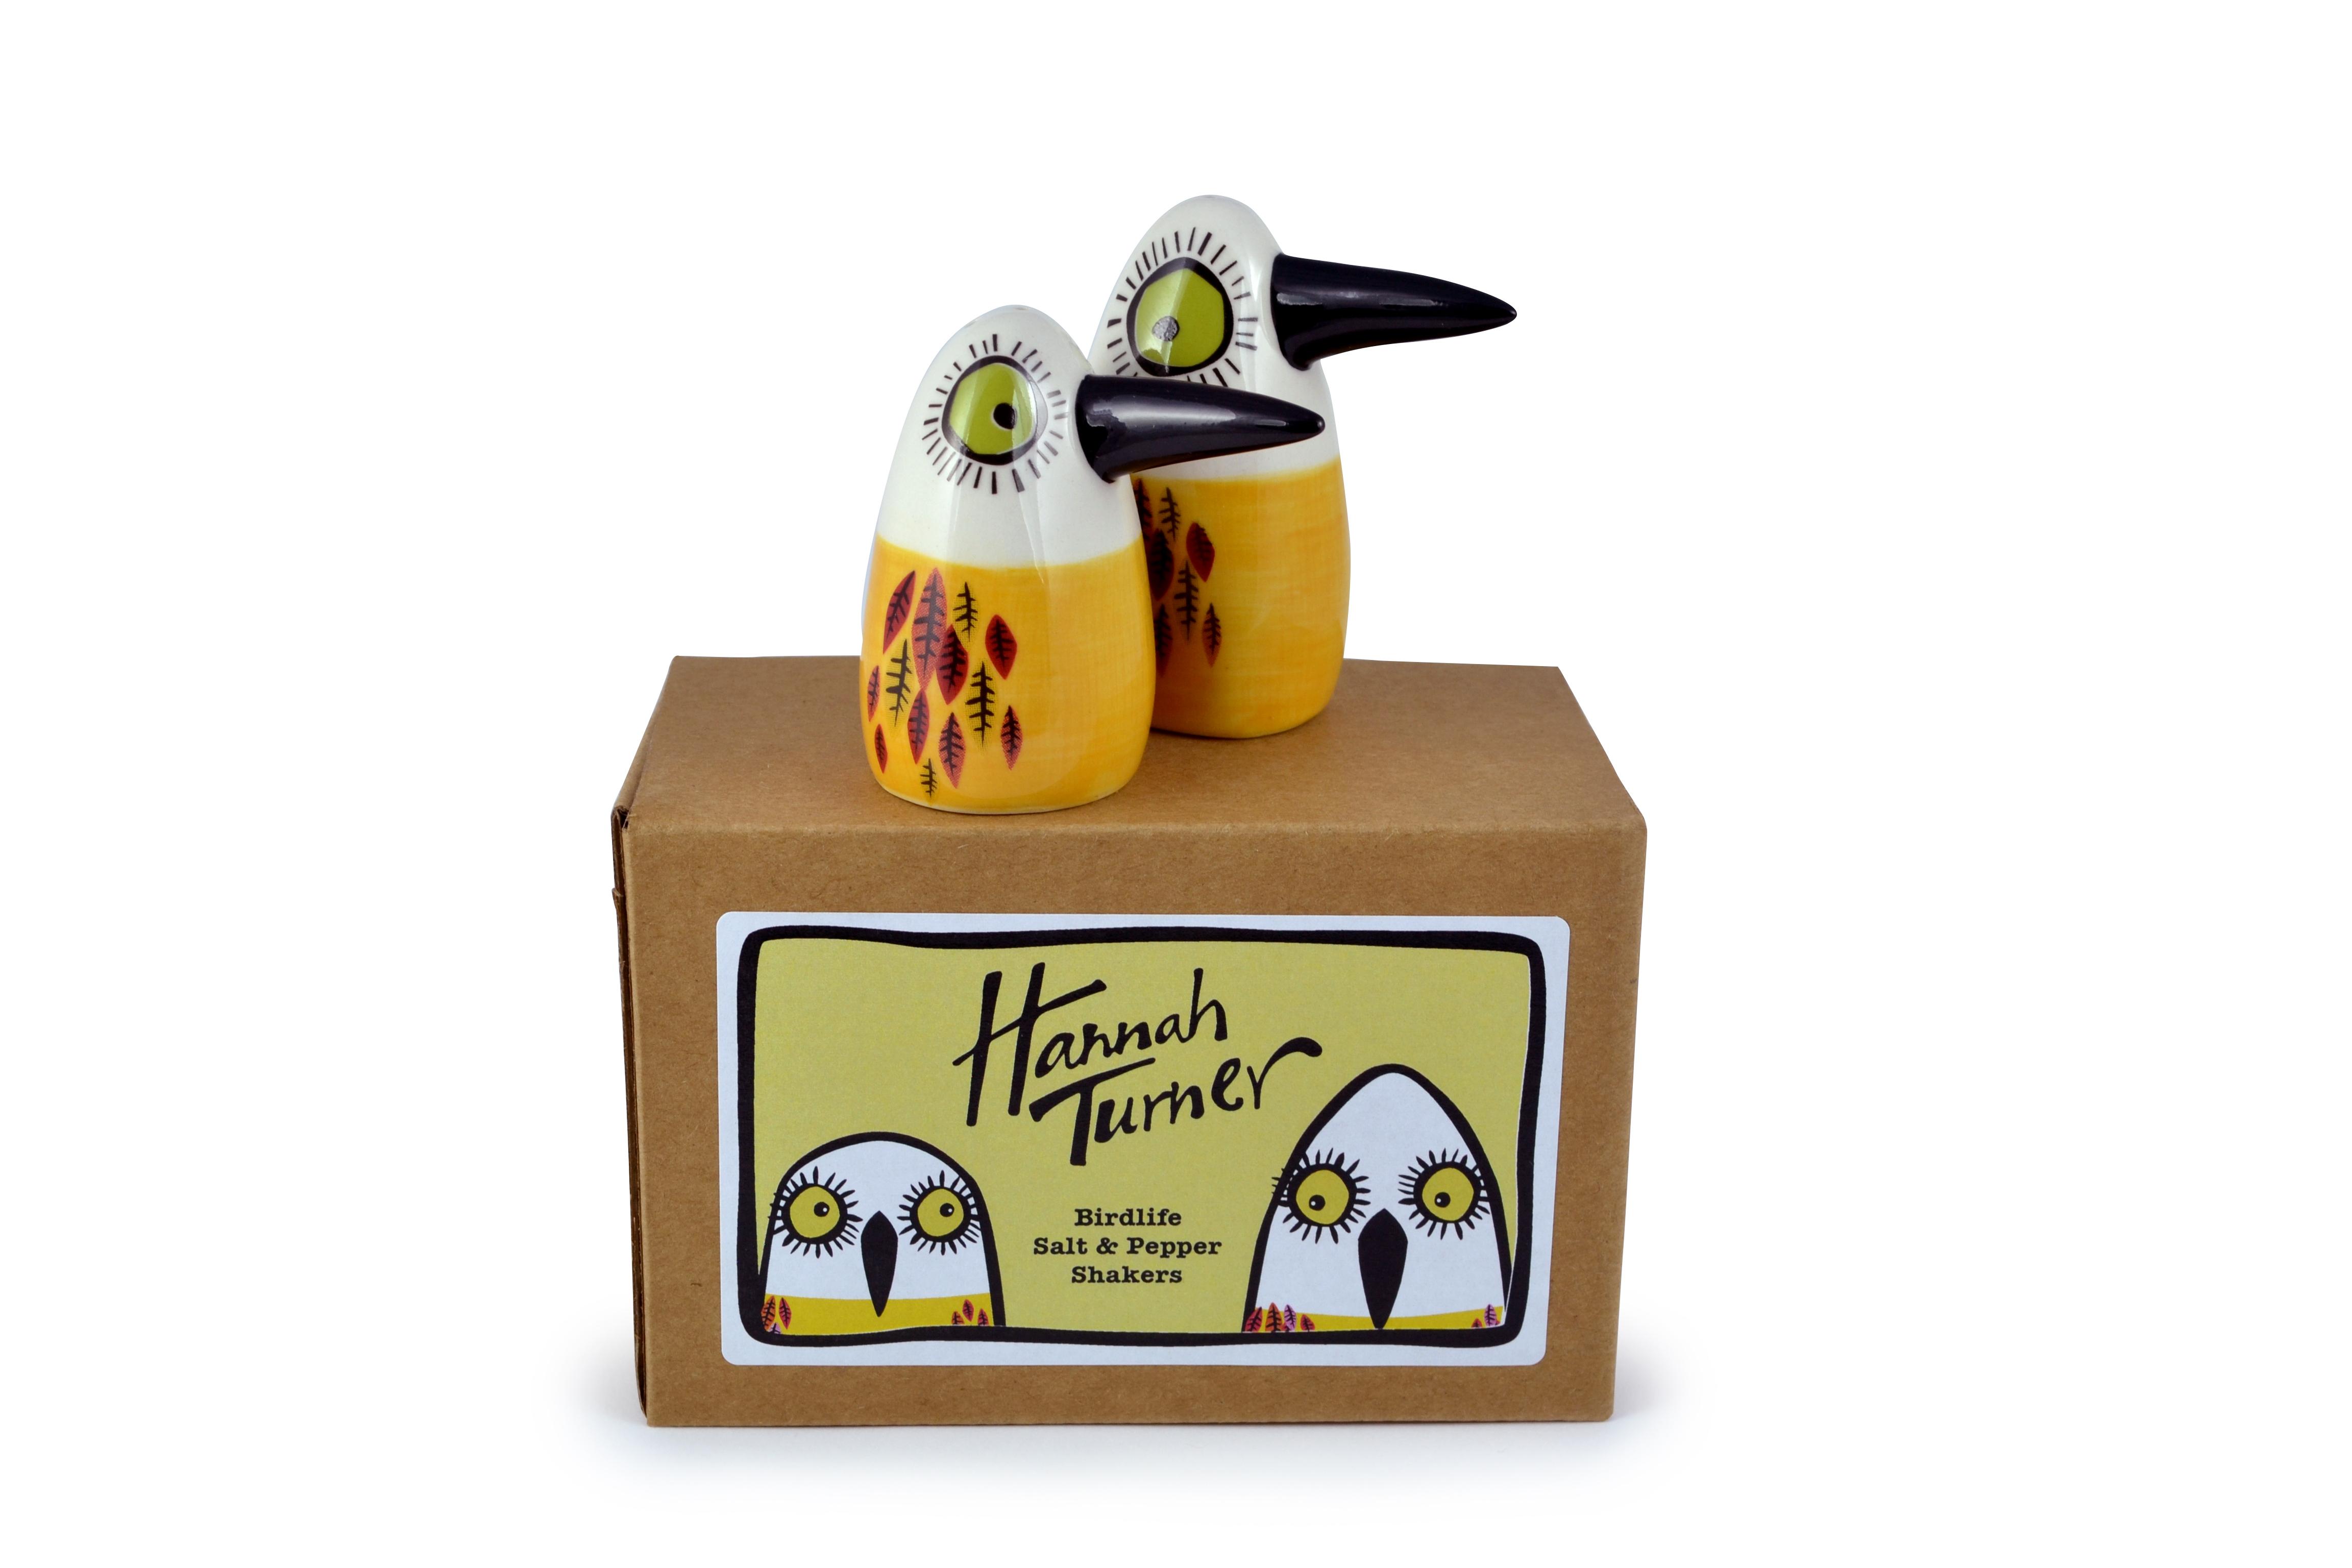 Birdlife Salt and Pepper Yellow Hannah Turner